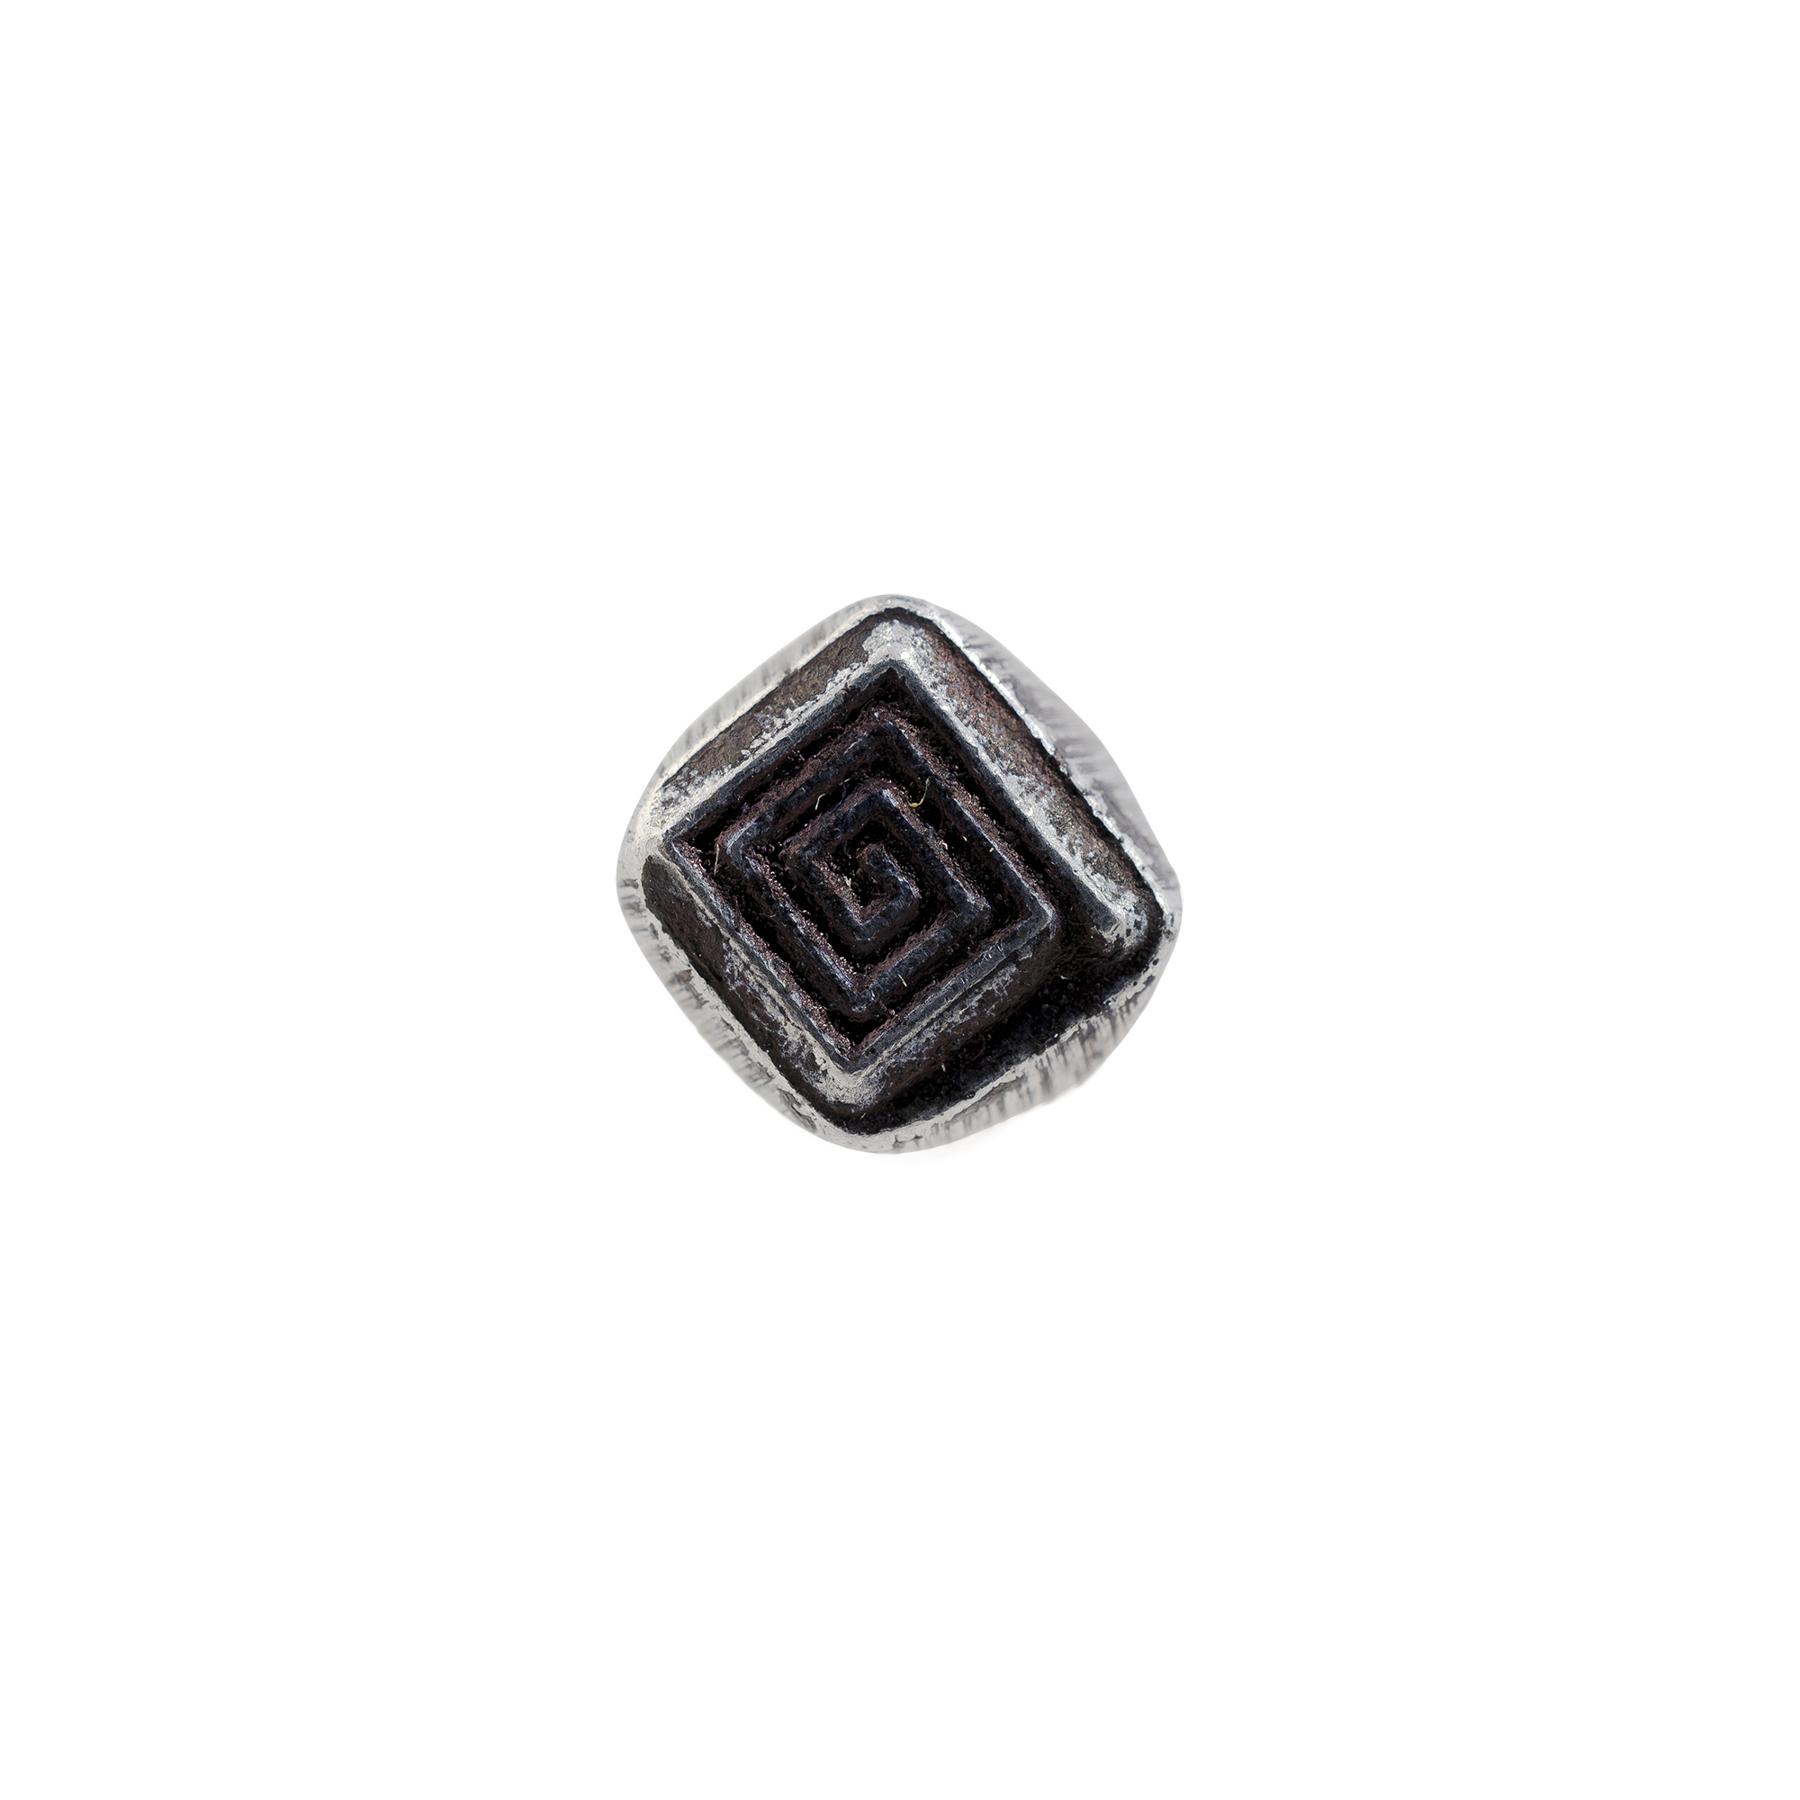 1 4 Square Spiral Geometric Stamp